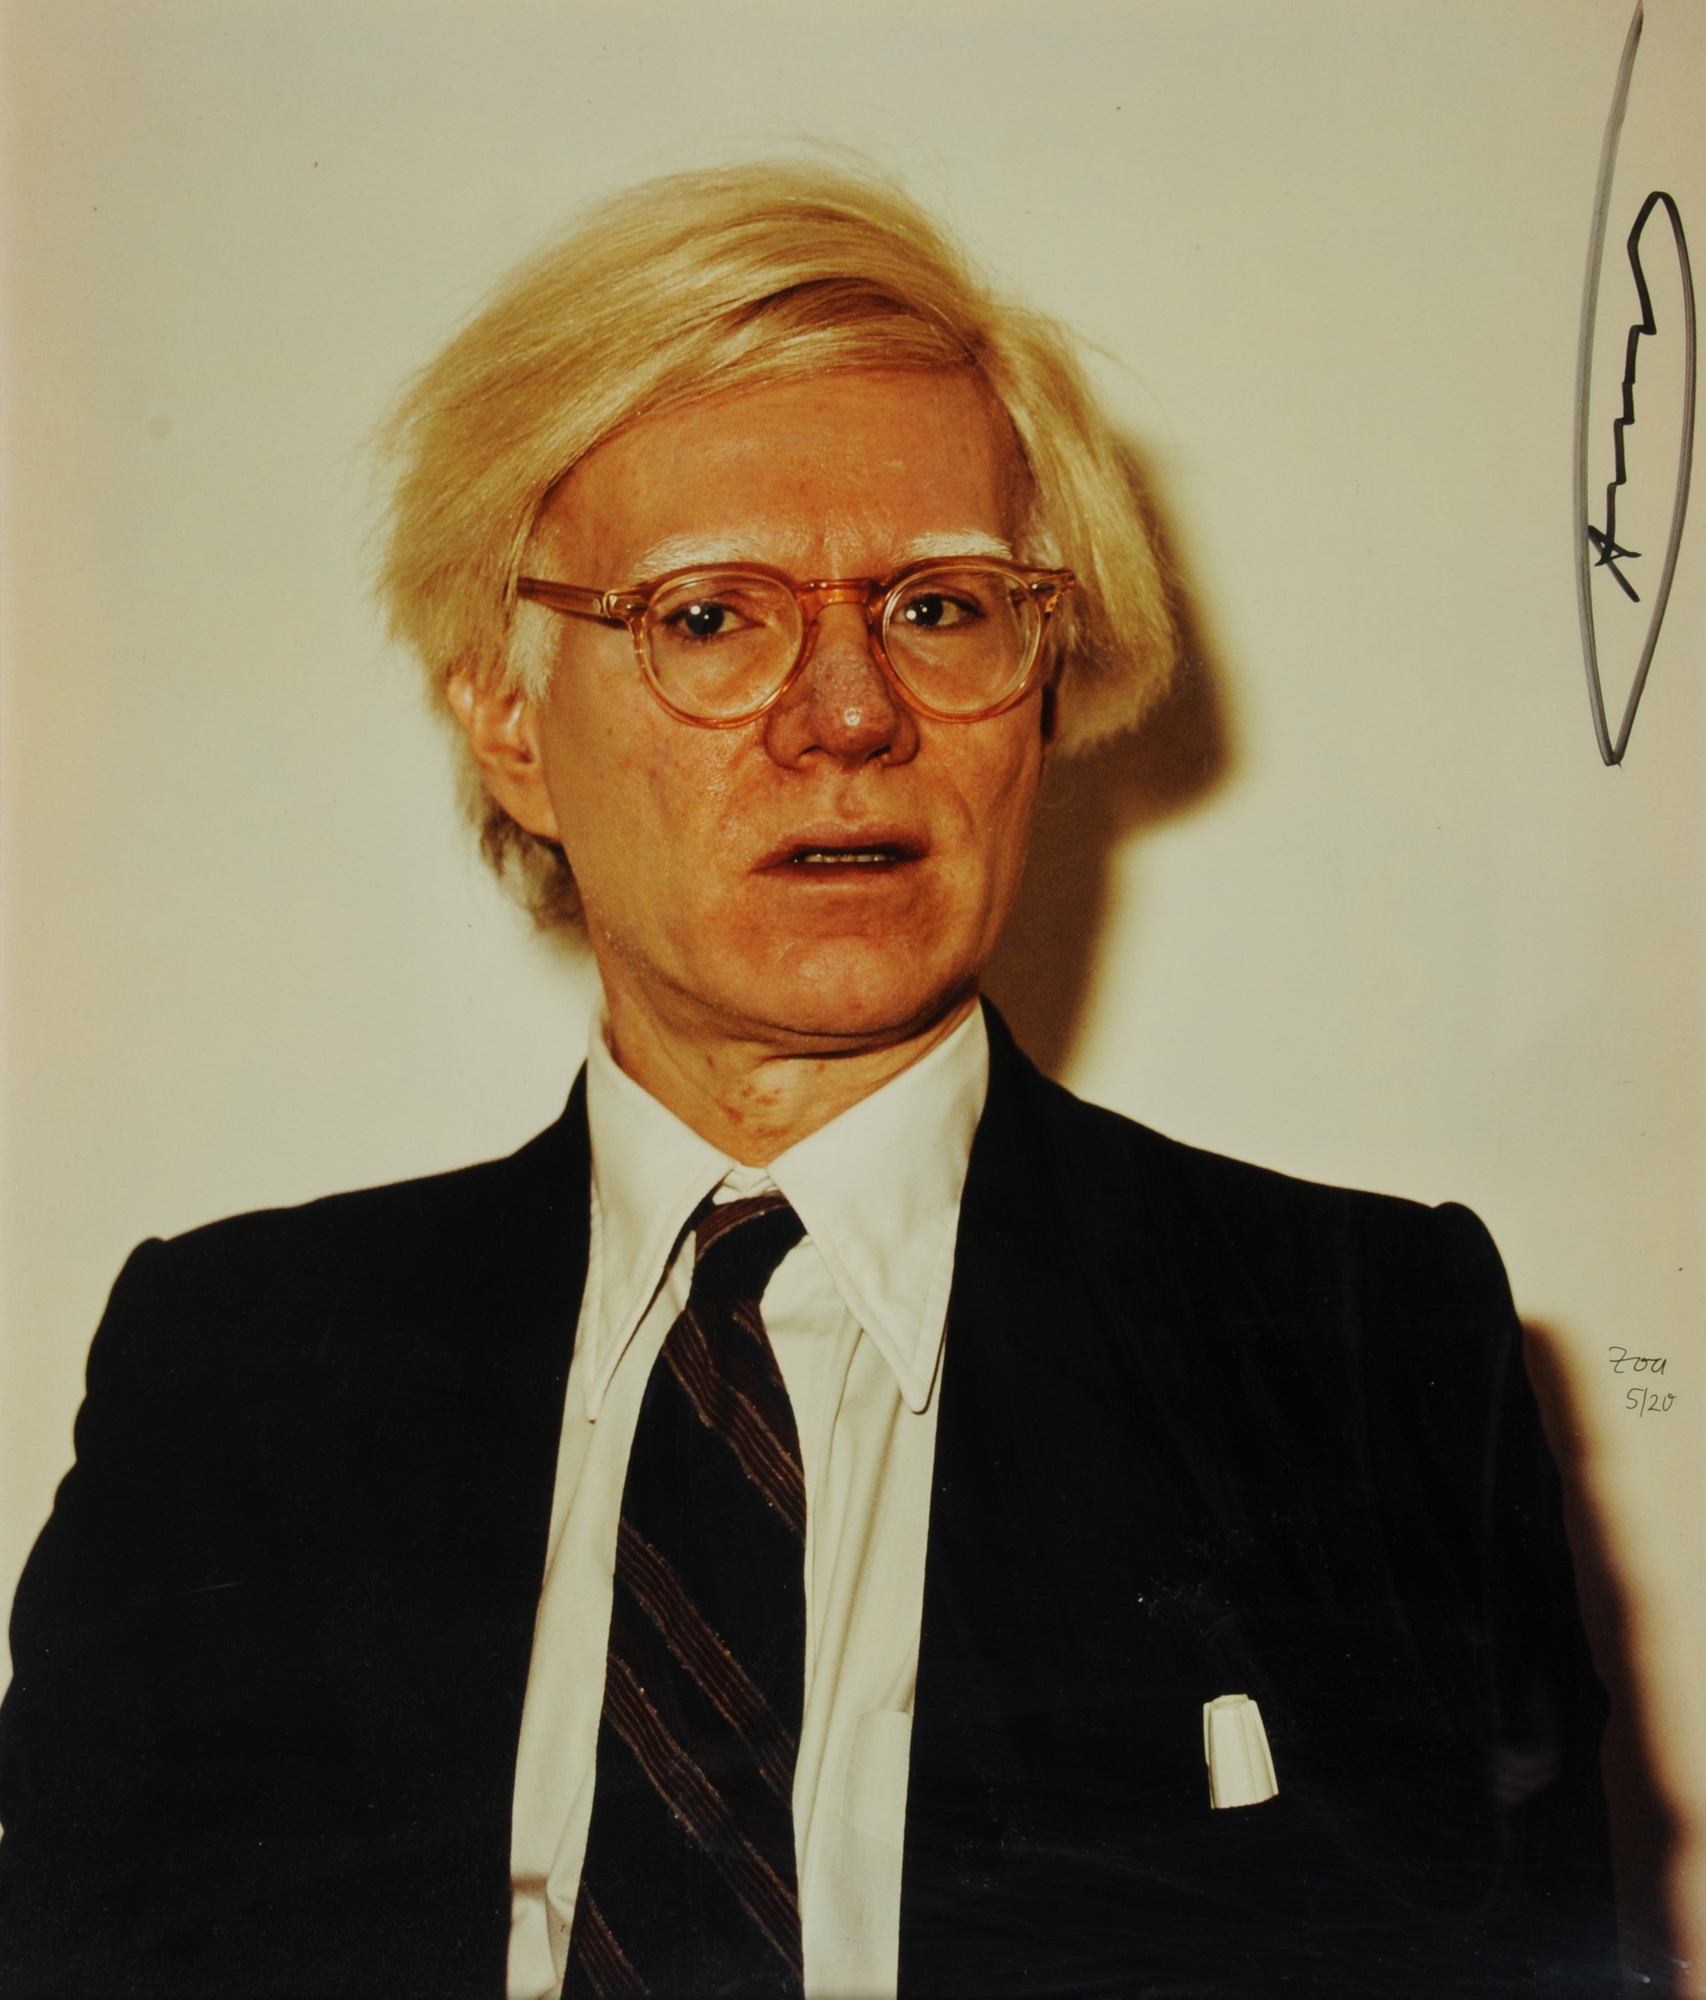 Zoa, 2 photographs: Andy Warhol